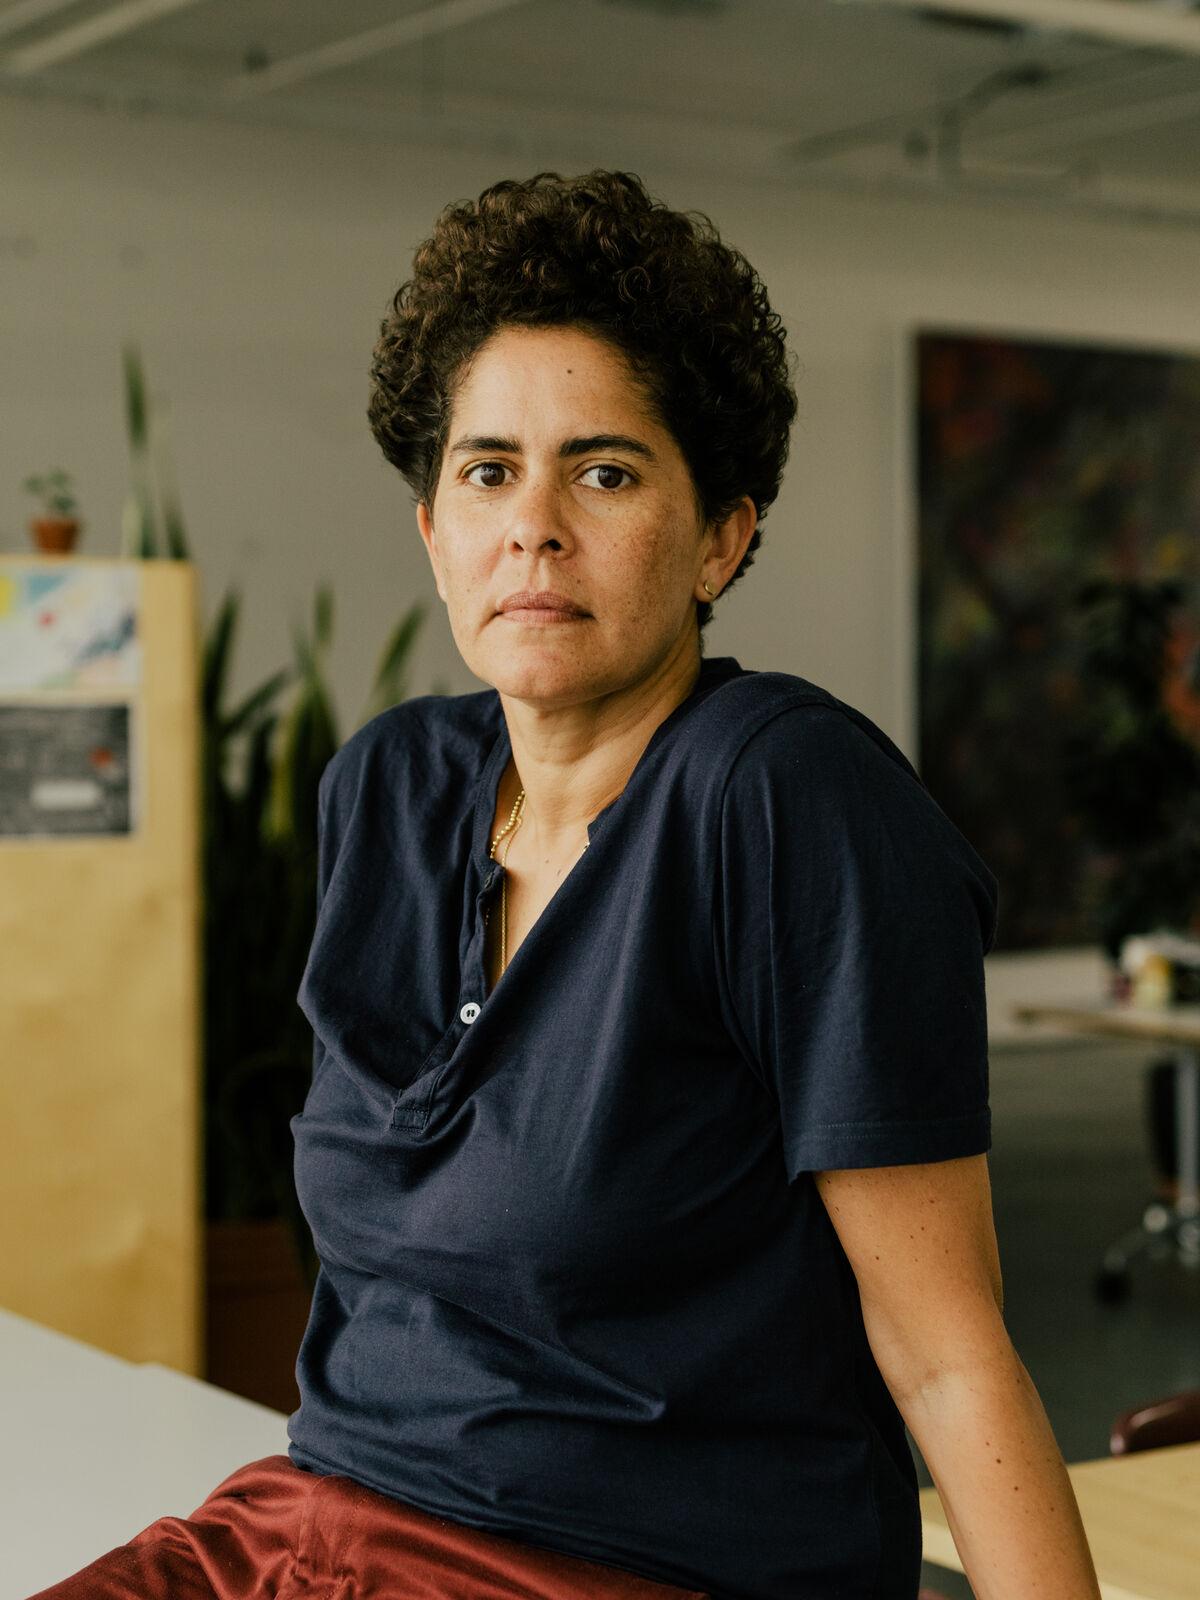 Portrait of Julie Mehretu by Daniel Dorsa for Artsy.